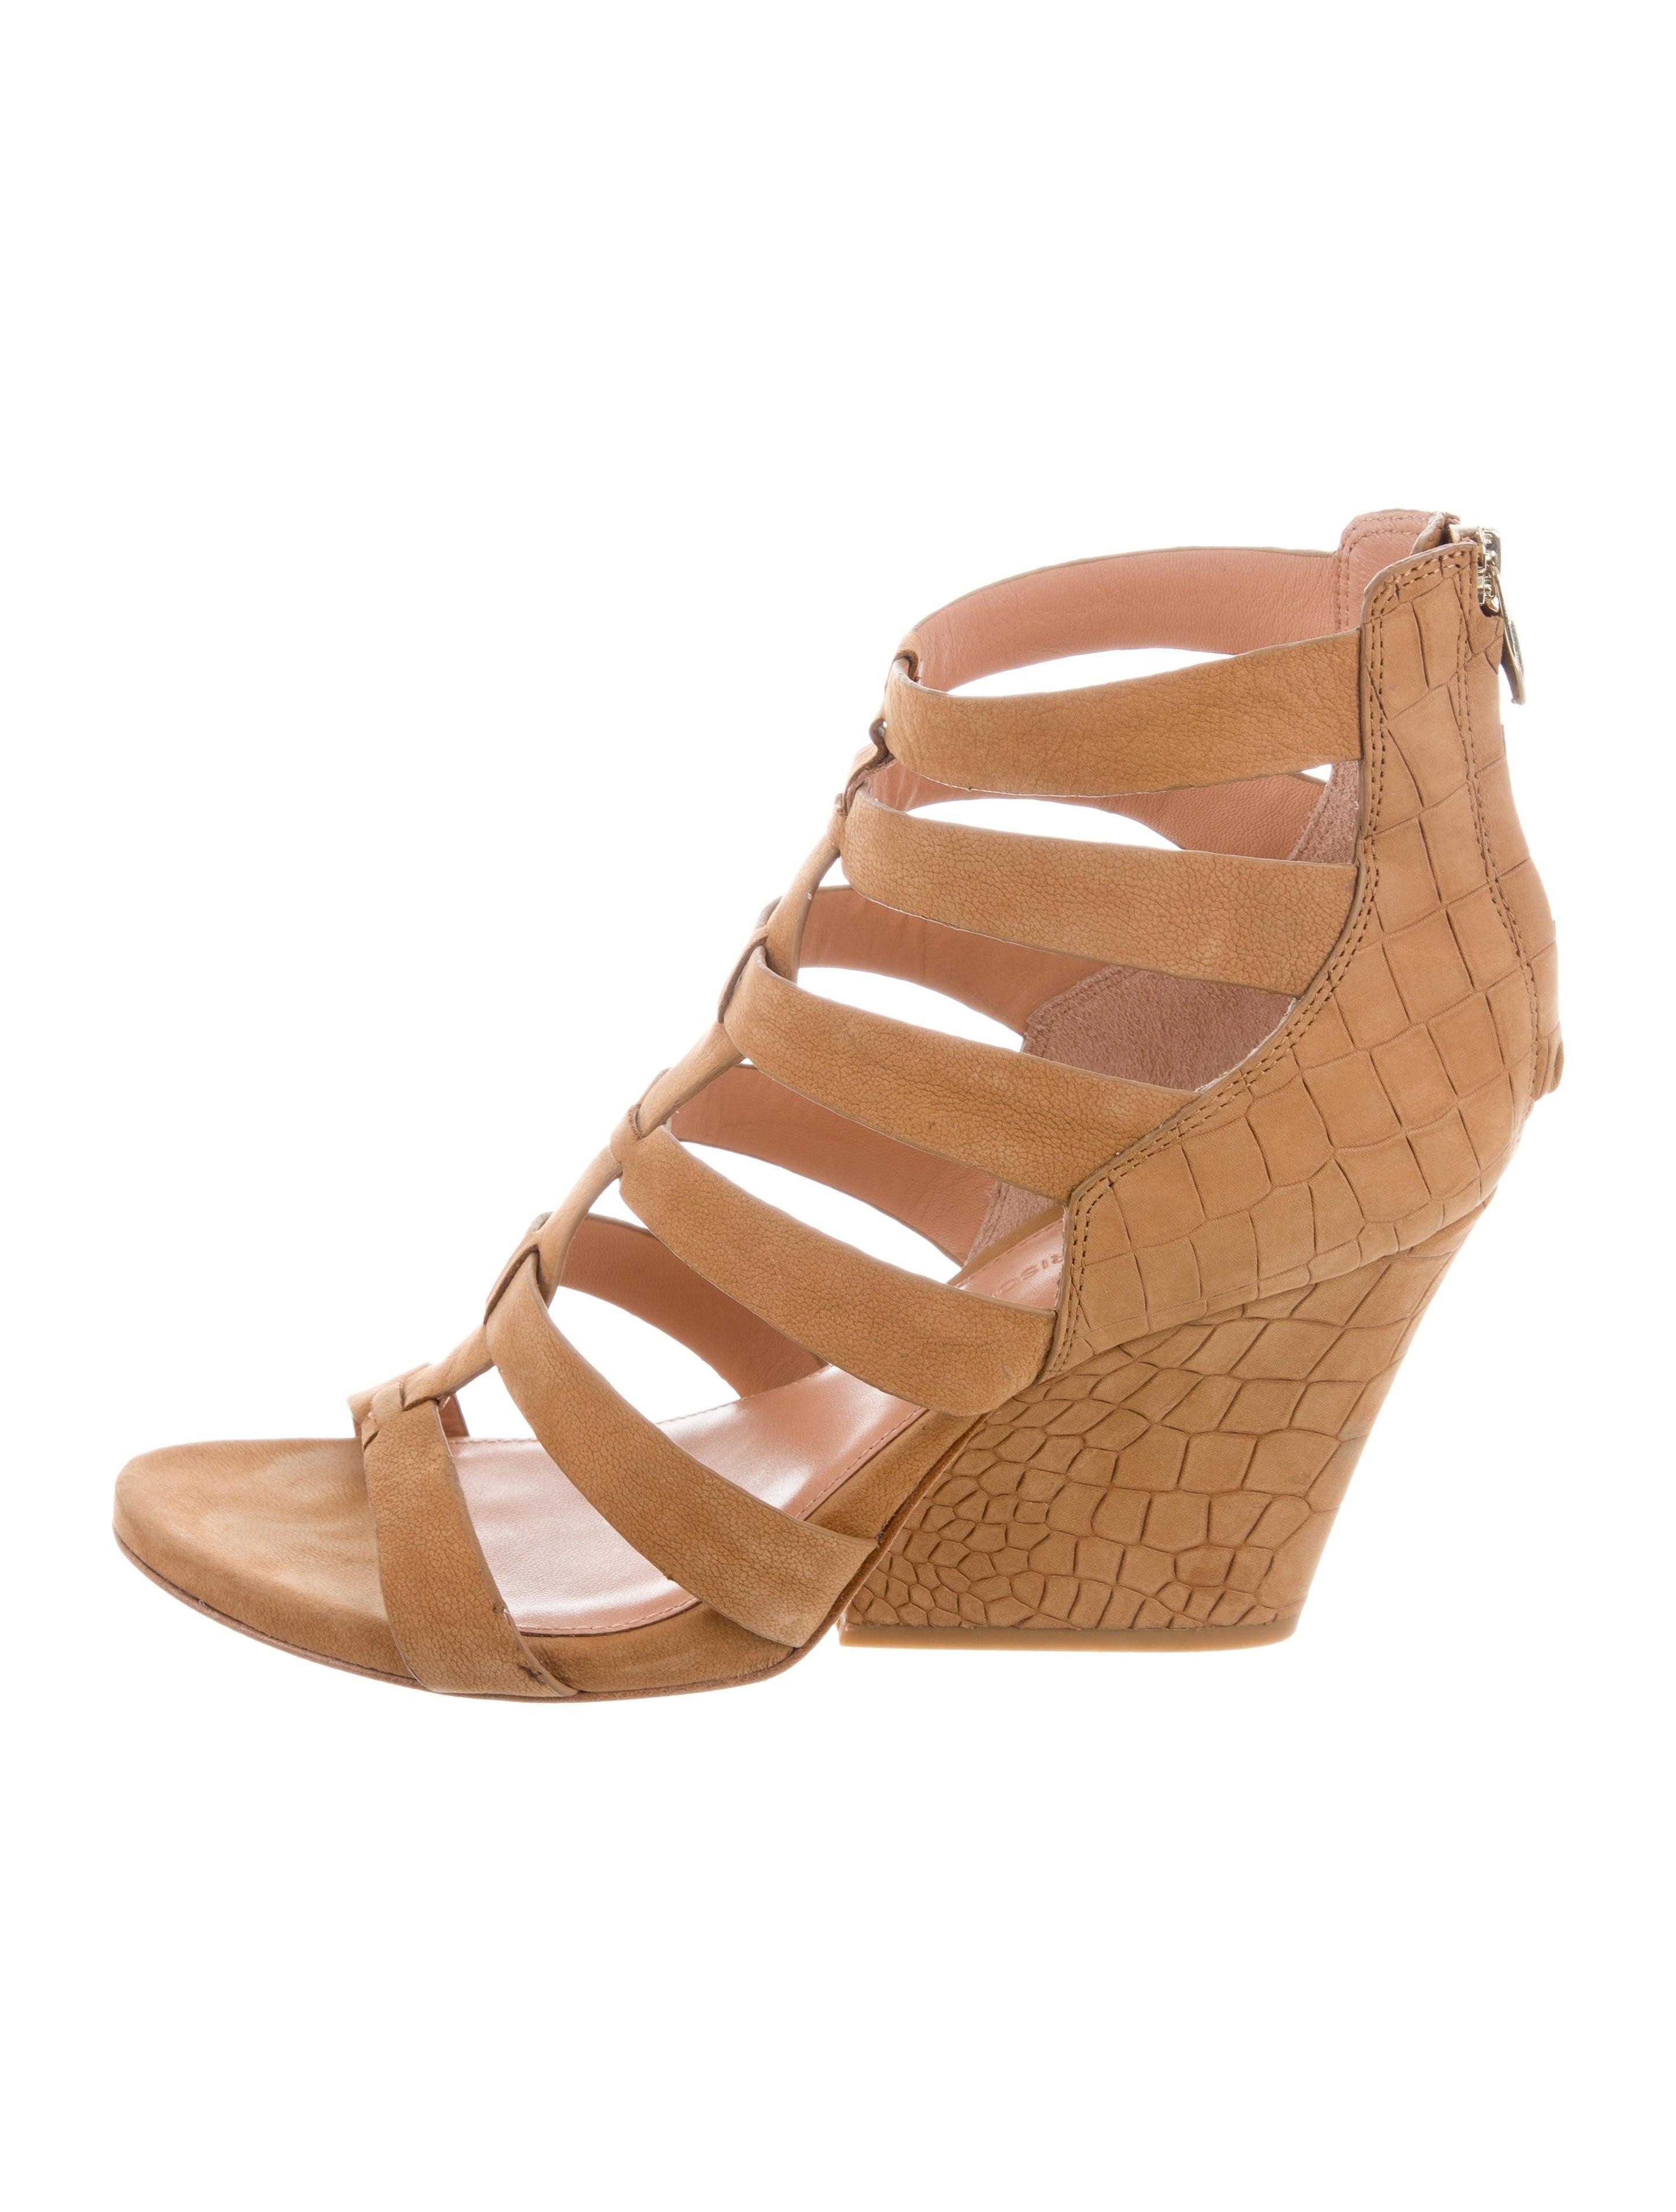 Sigerson Morrison Nubuck Cage Sandals affordable cBDiQGKvw